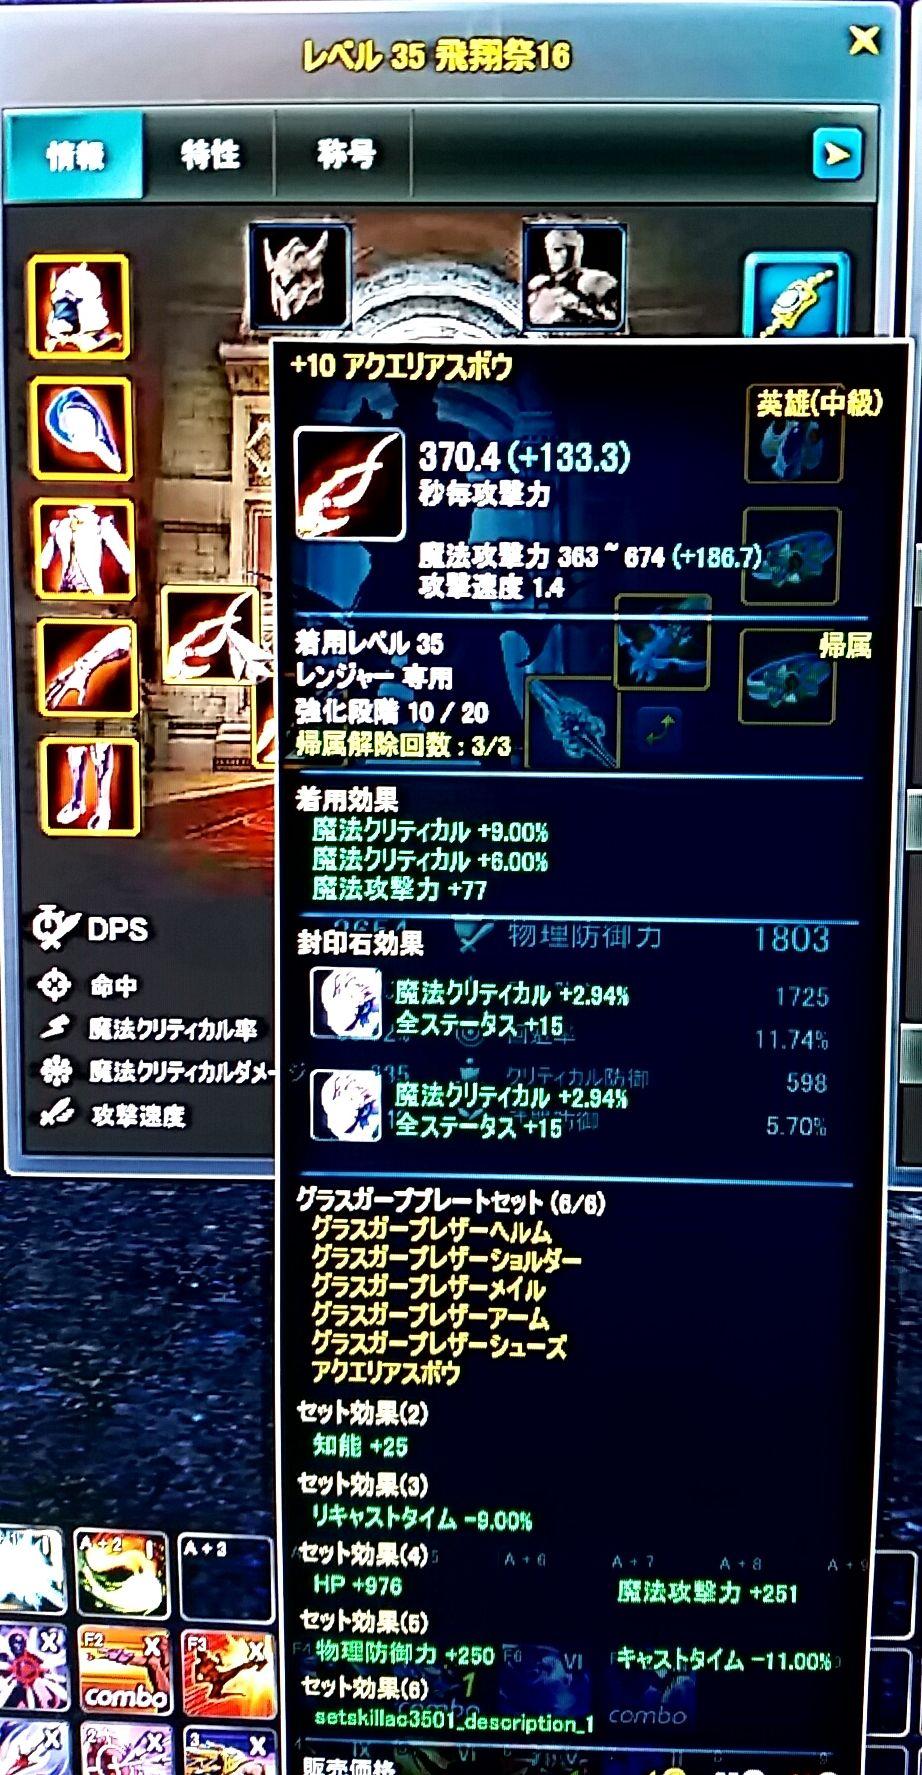 20151101_153958383